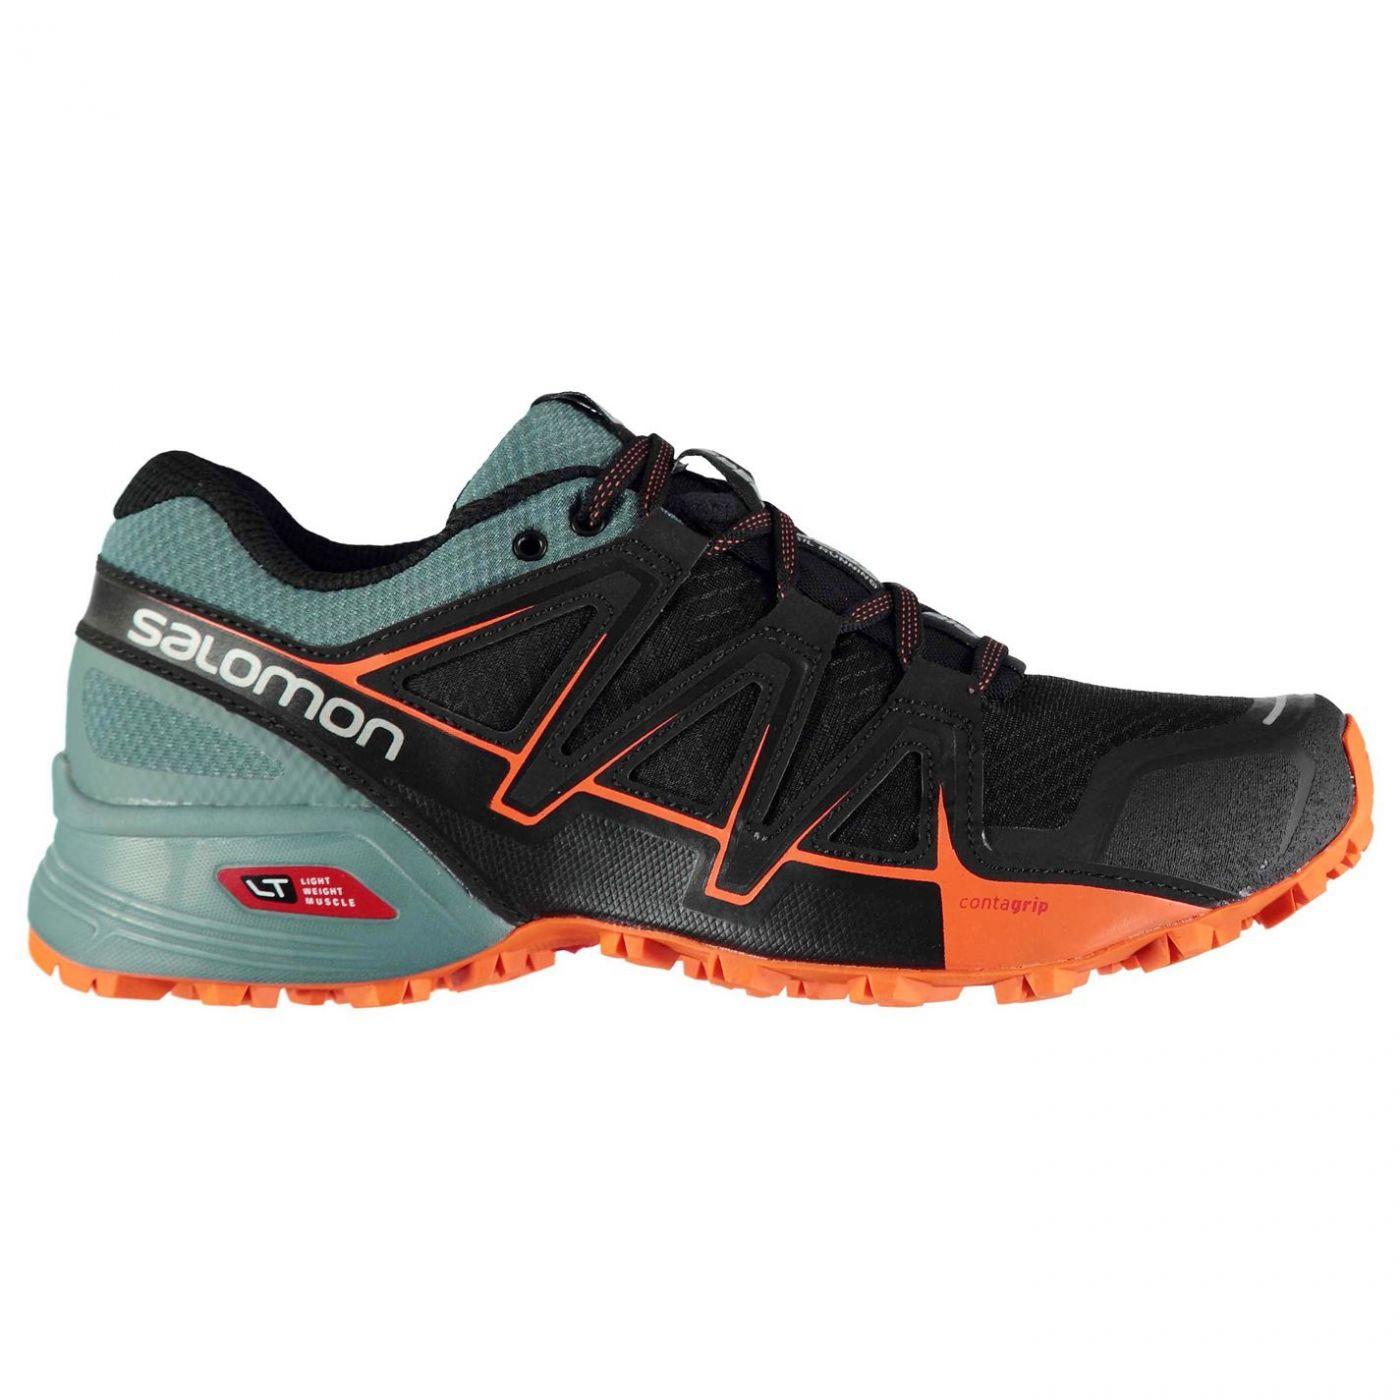 Salomon Speedcross Vario 2 Mens Trail Running Shoes - FACTCOOL